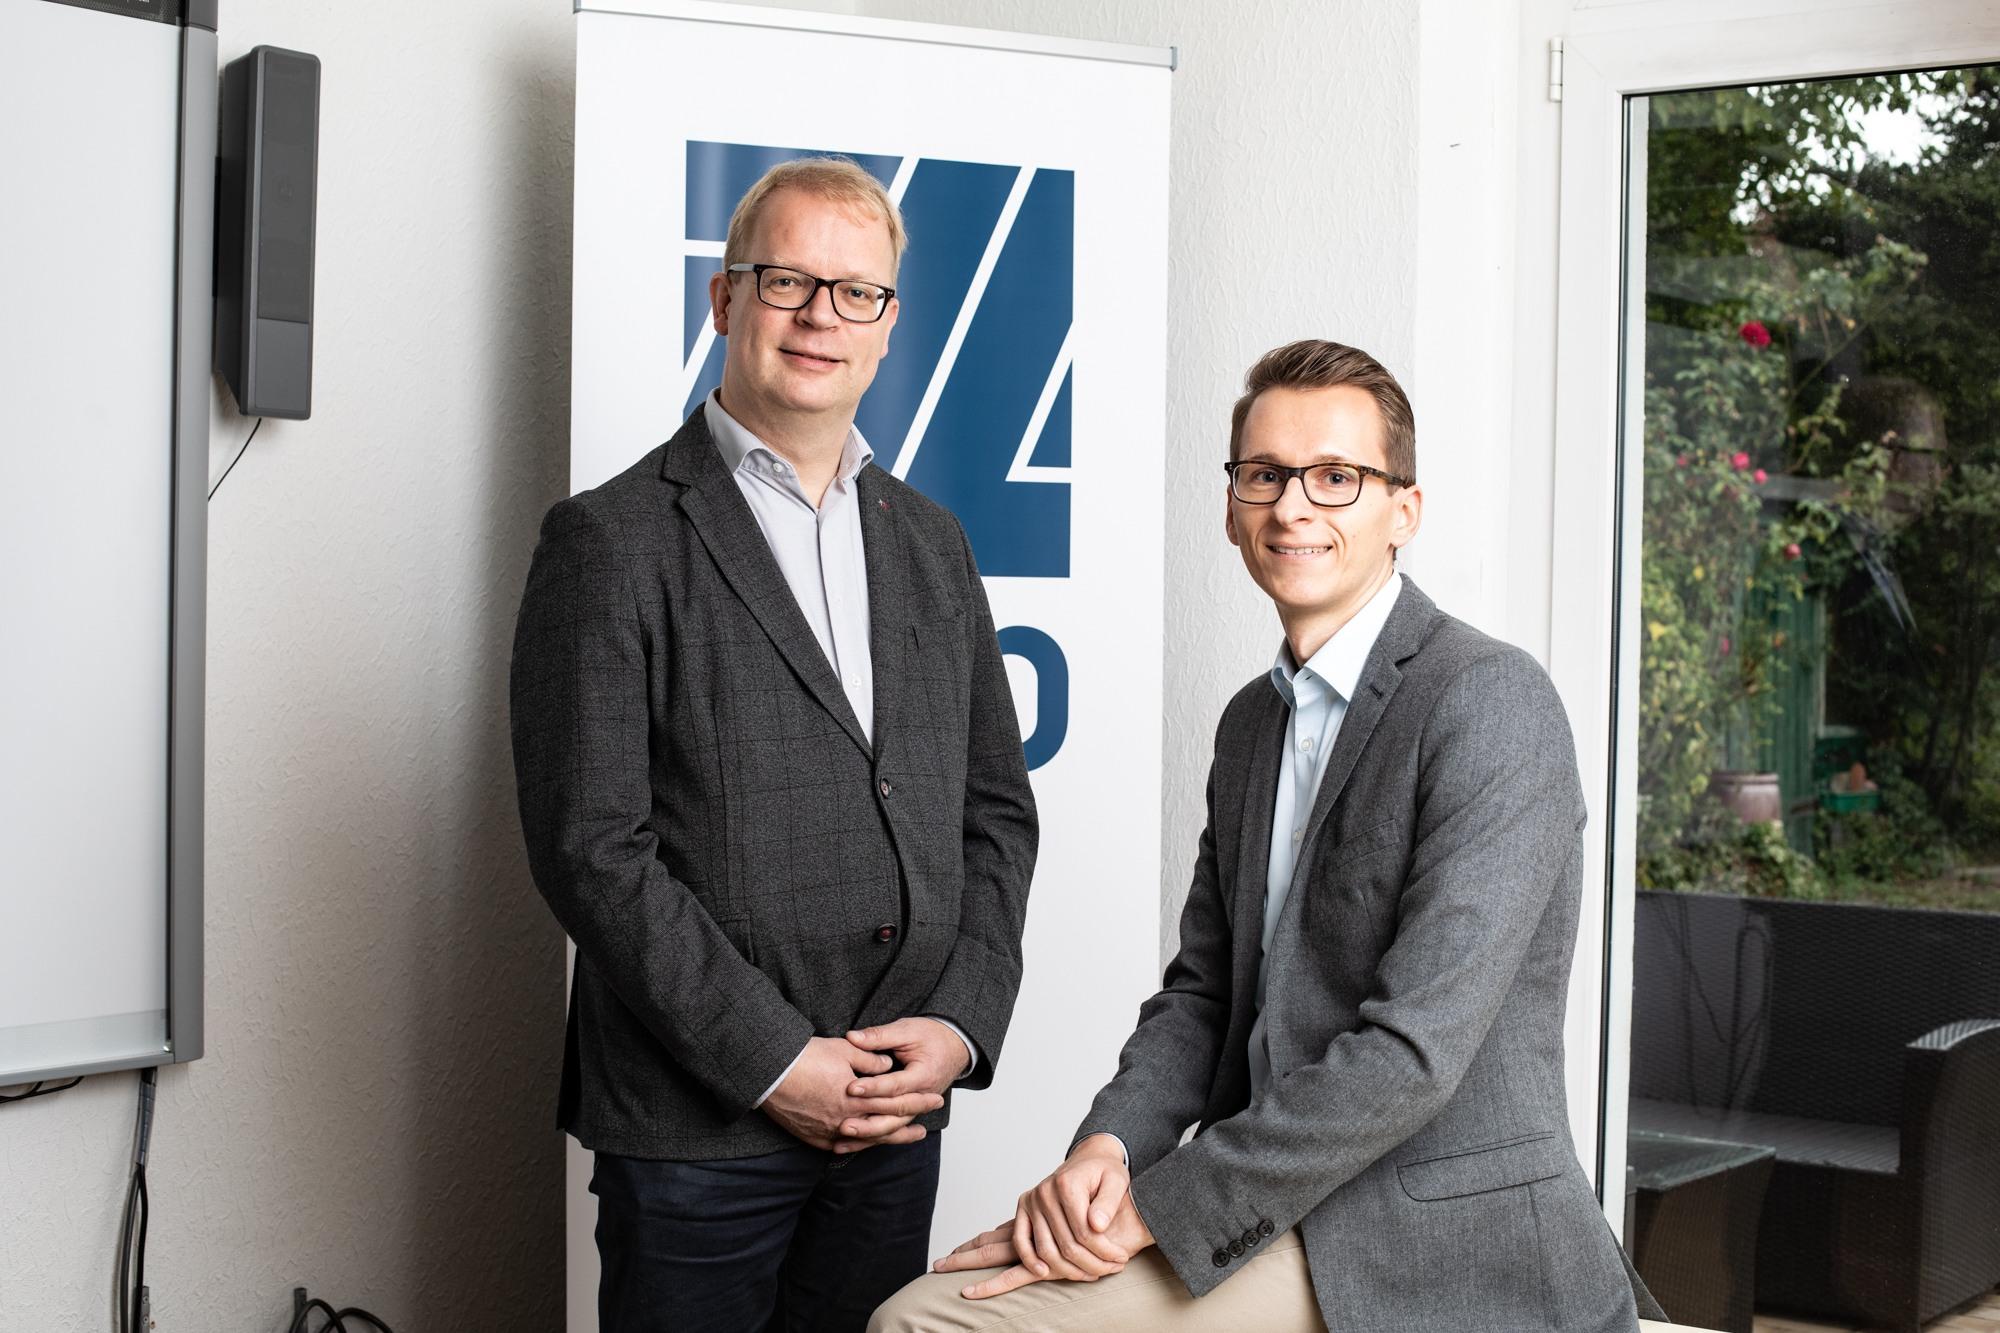 Benedikt Jürgens & Björn Szymanowski